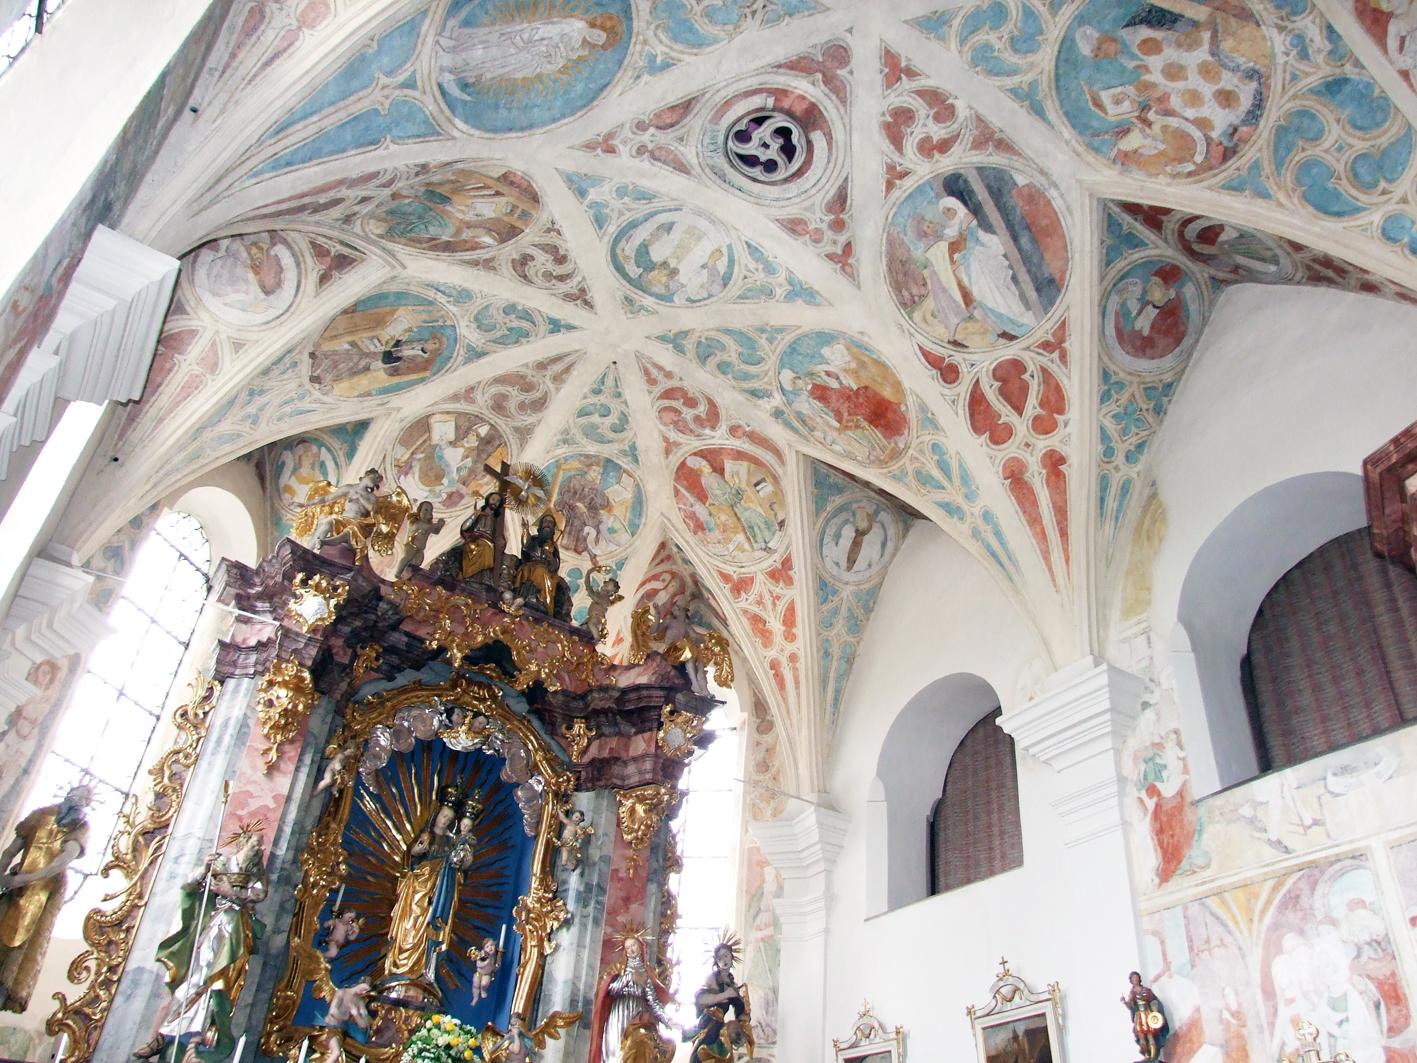 2021 05 17 aoelfb niedergottsau kirche mariae himmelfahrt fresken und gnadenbild